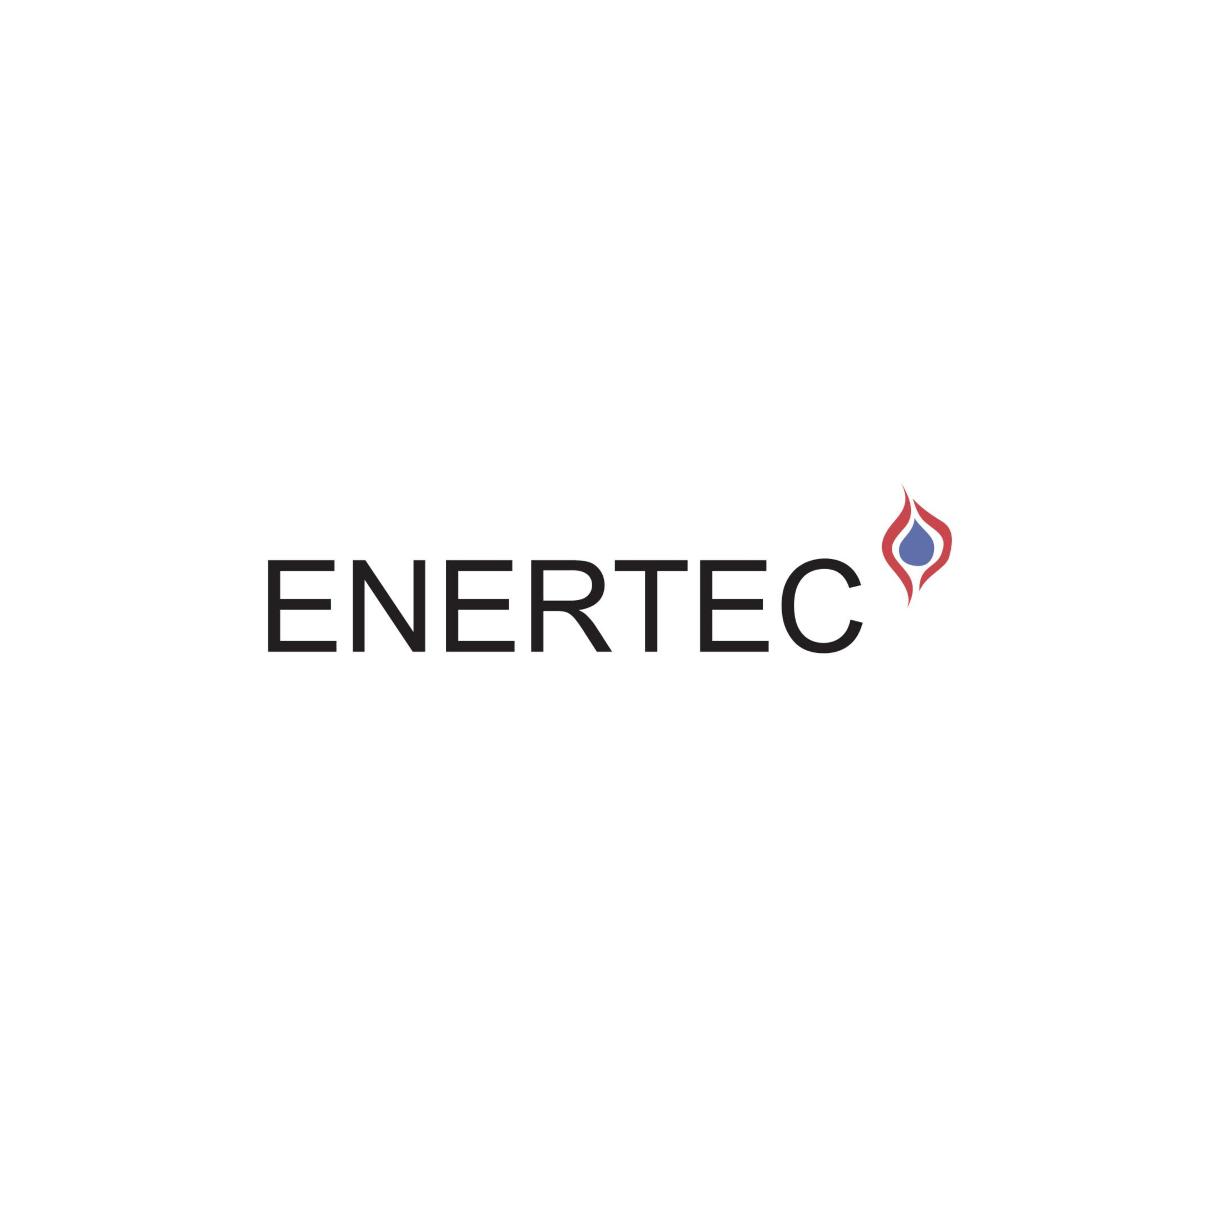 Enertec In South Portland Me 04106 Chamberofcommerce Com